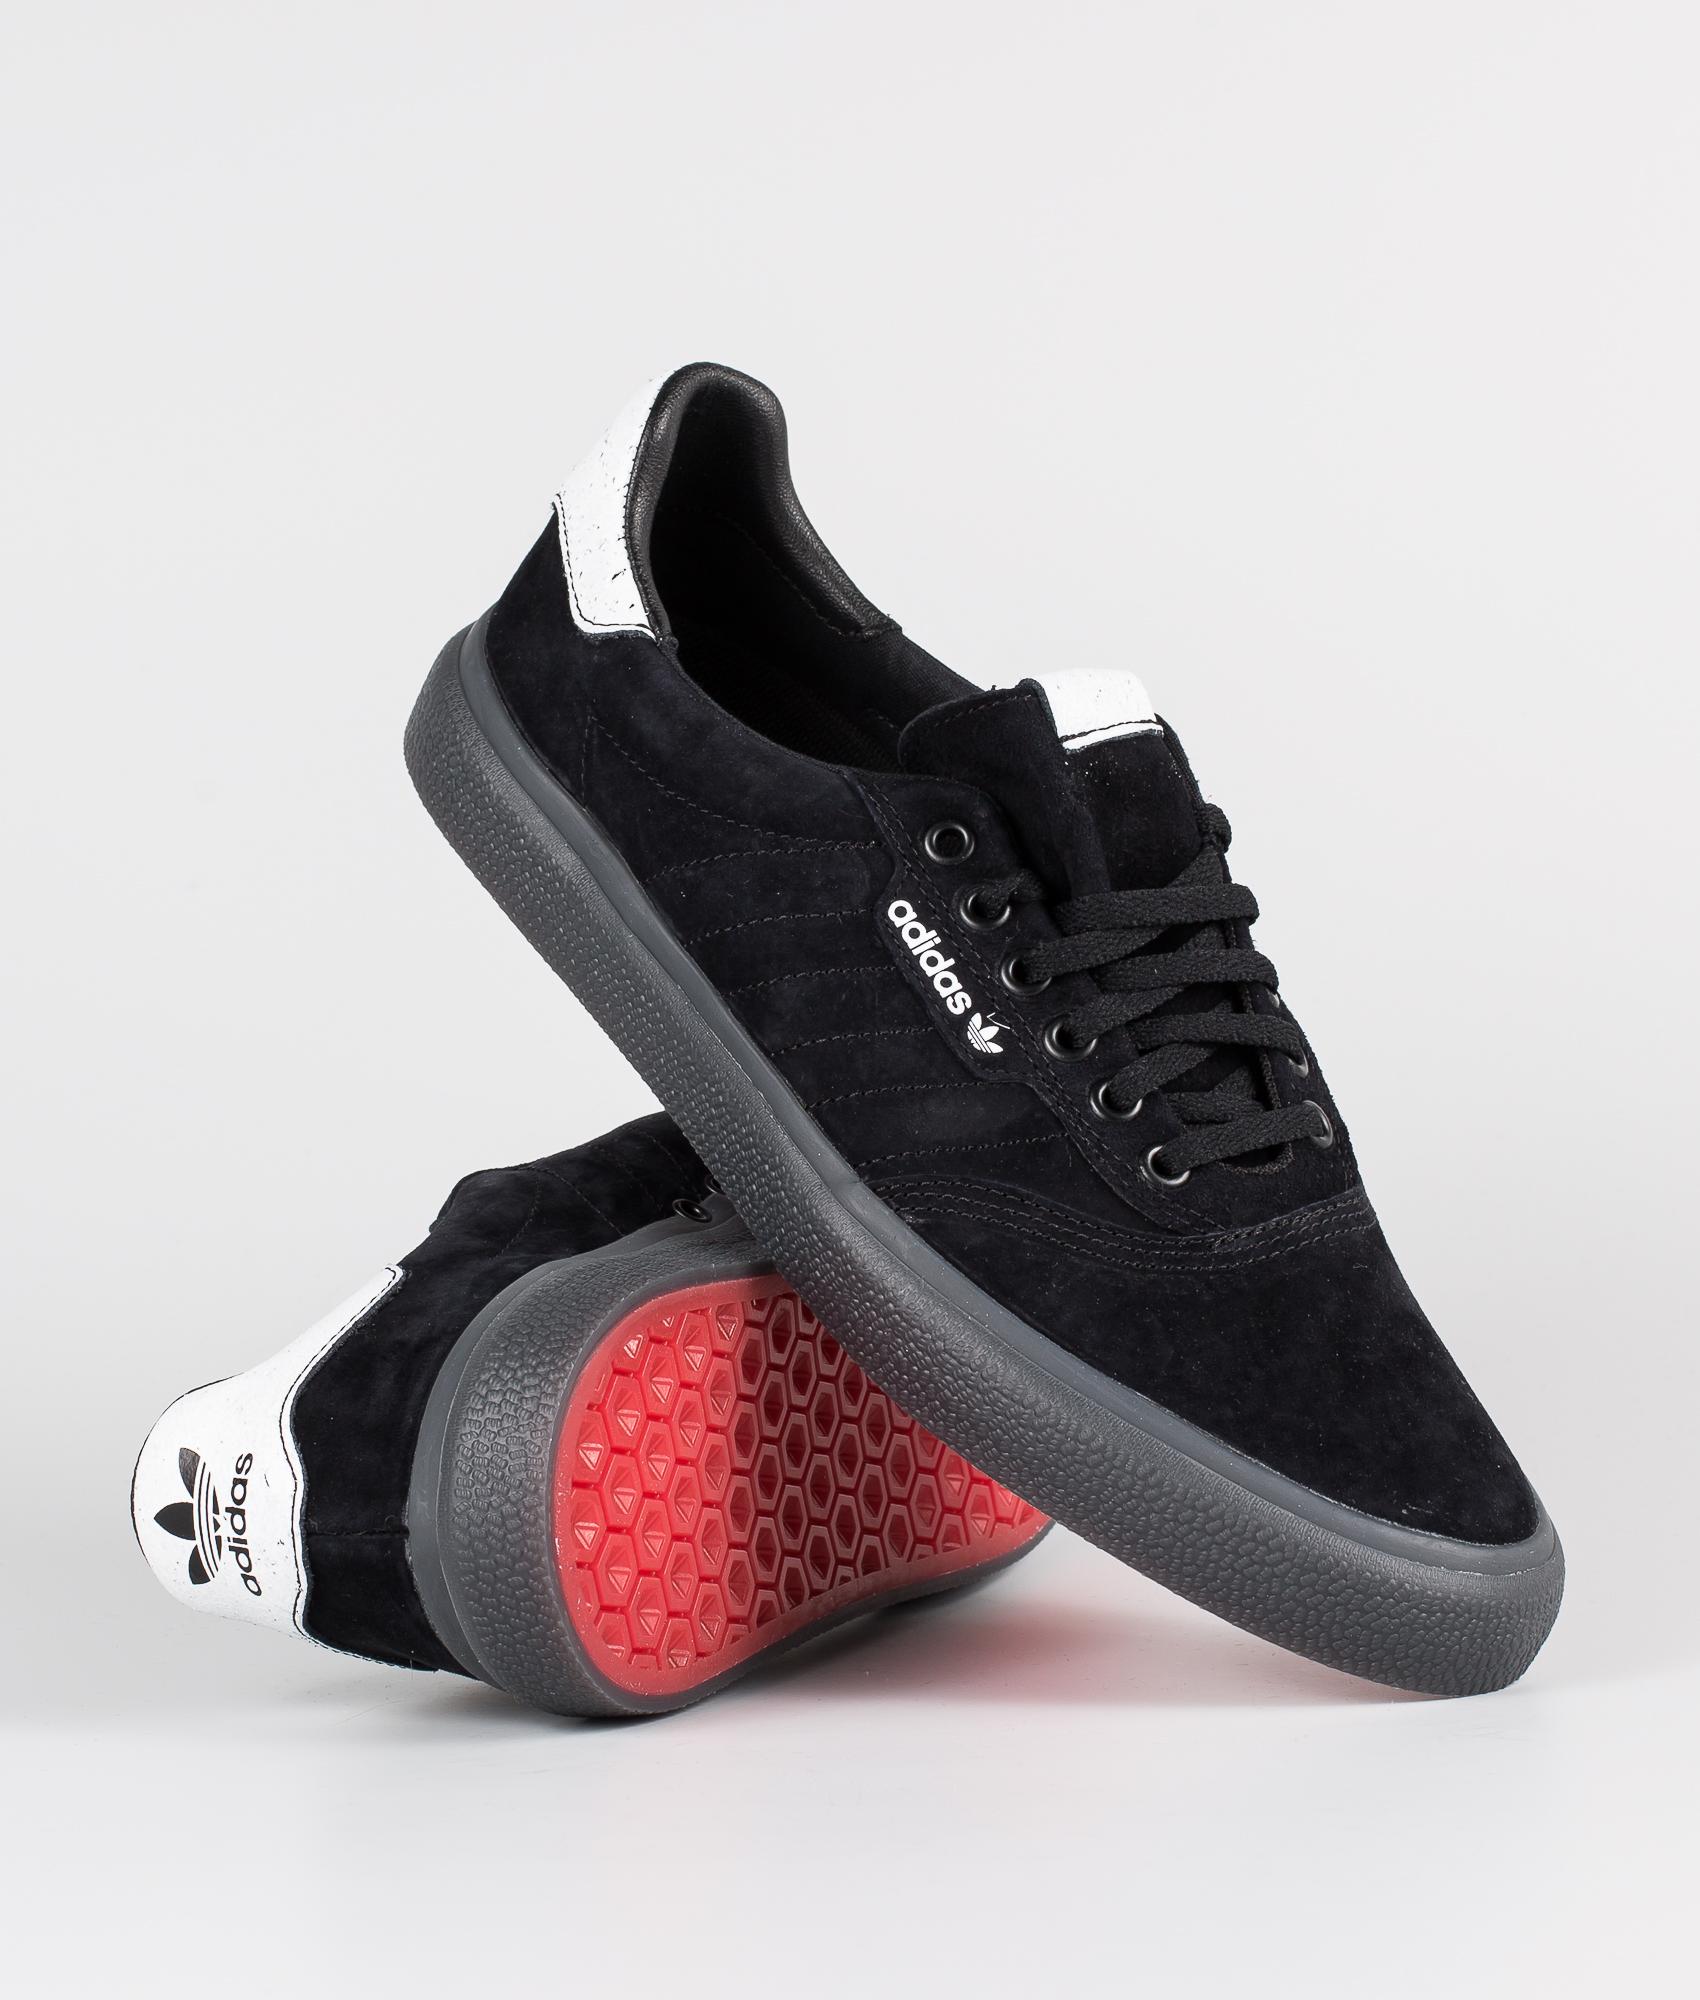 Blackftw Originals Ridestore ch Whitechsogr Schuhe Adidas 3mc Core vmnON08ywP